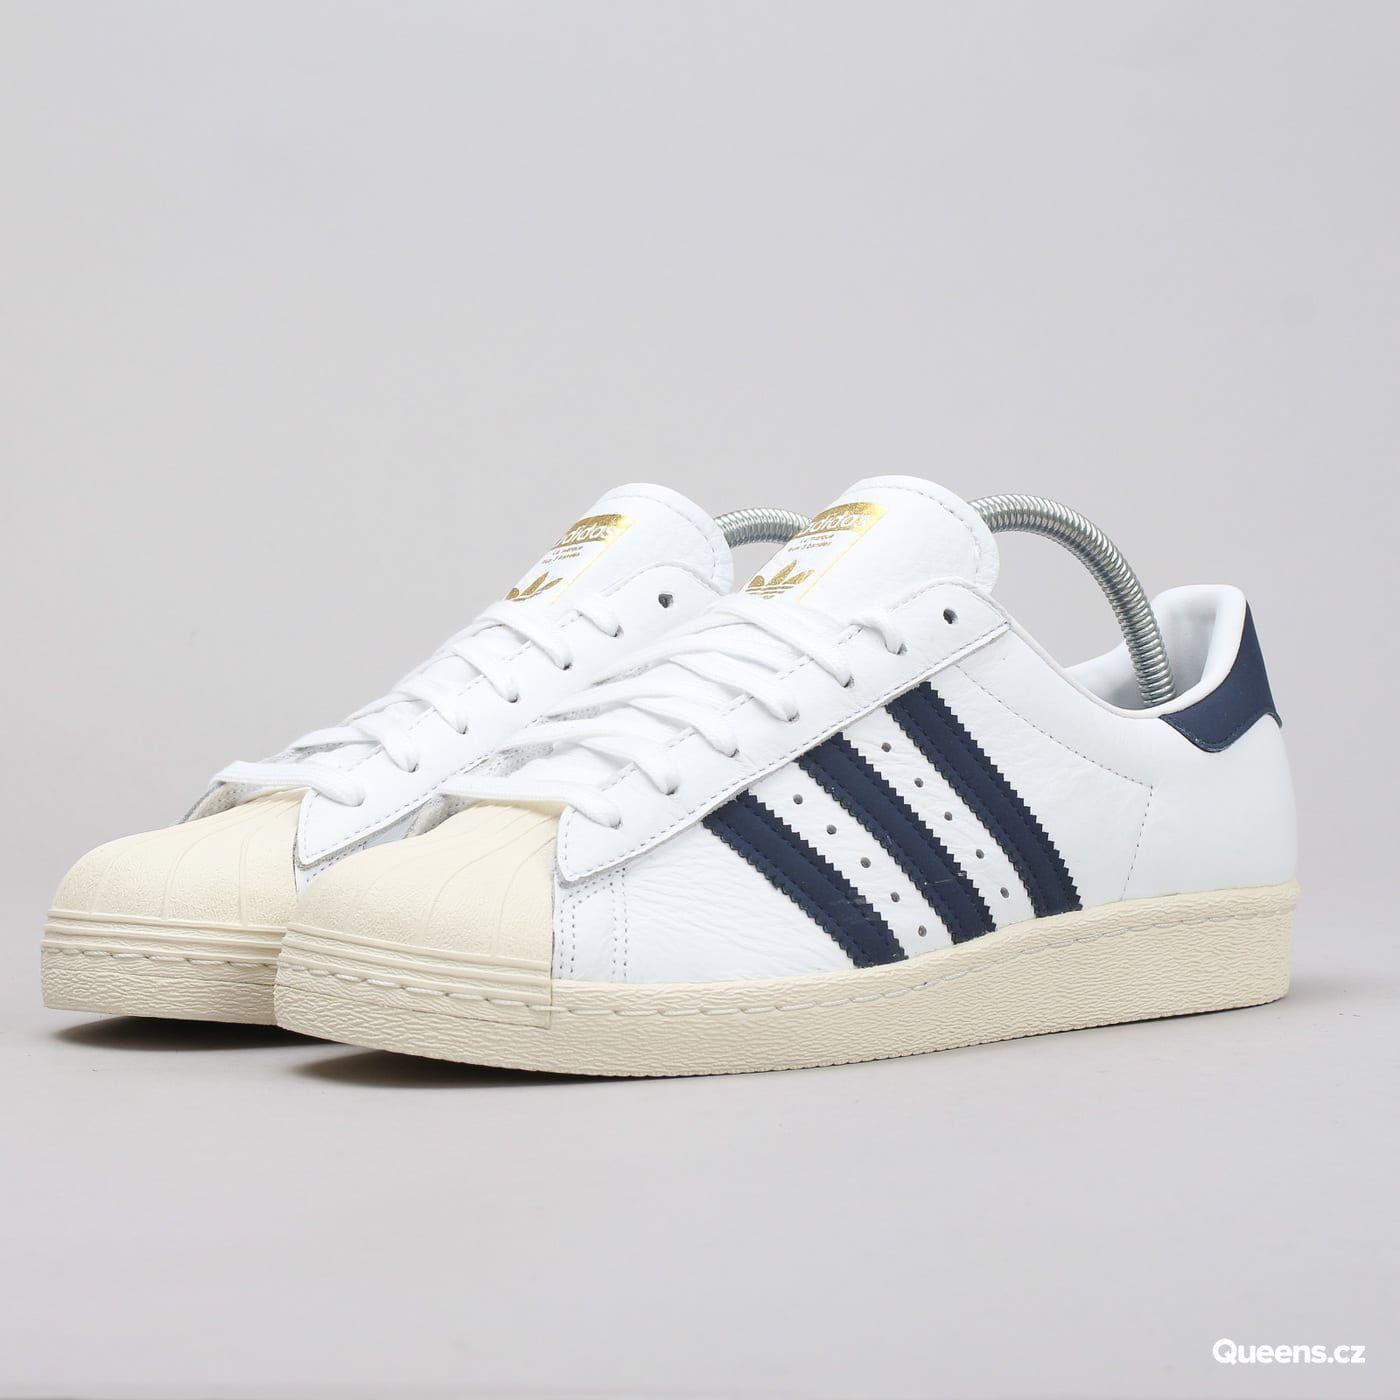 ... 2bd791411614 Boty adidas Superstar 80s (BZ0145) – Queens 💚 Boty Adidas  .. ... 832b092a19